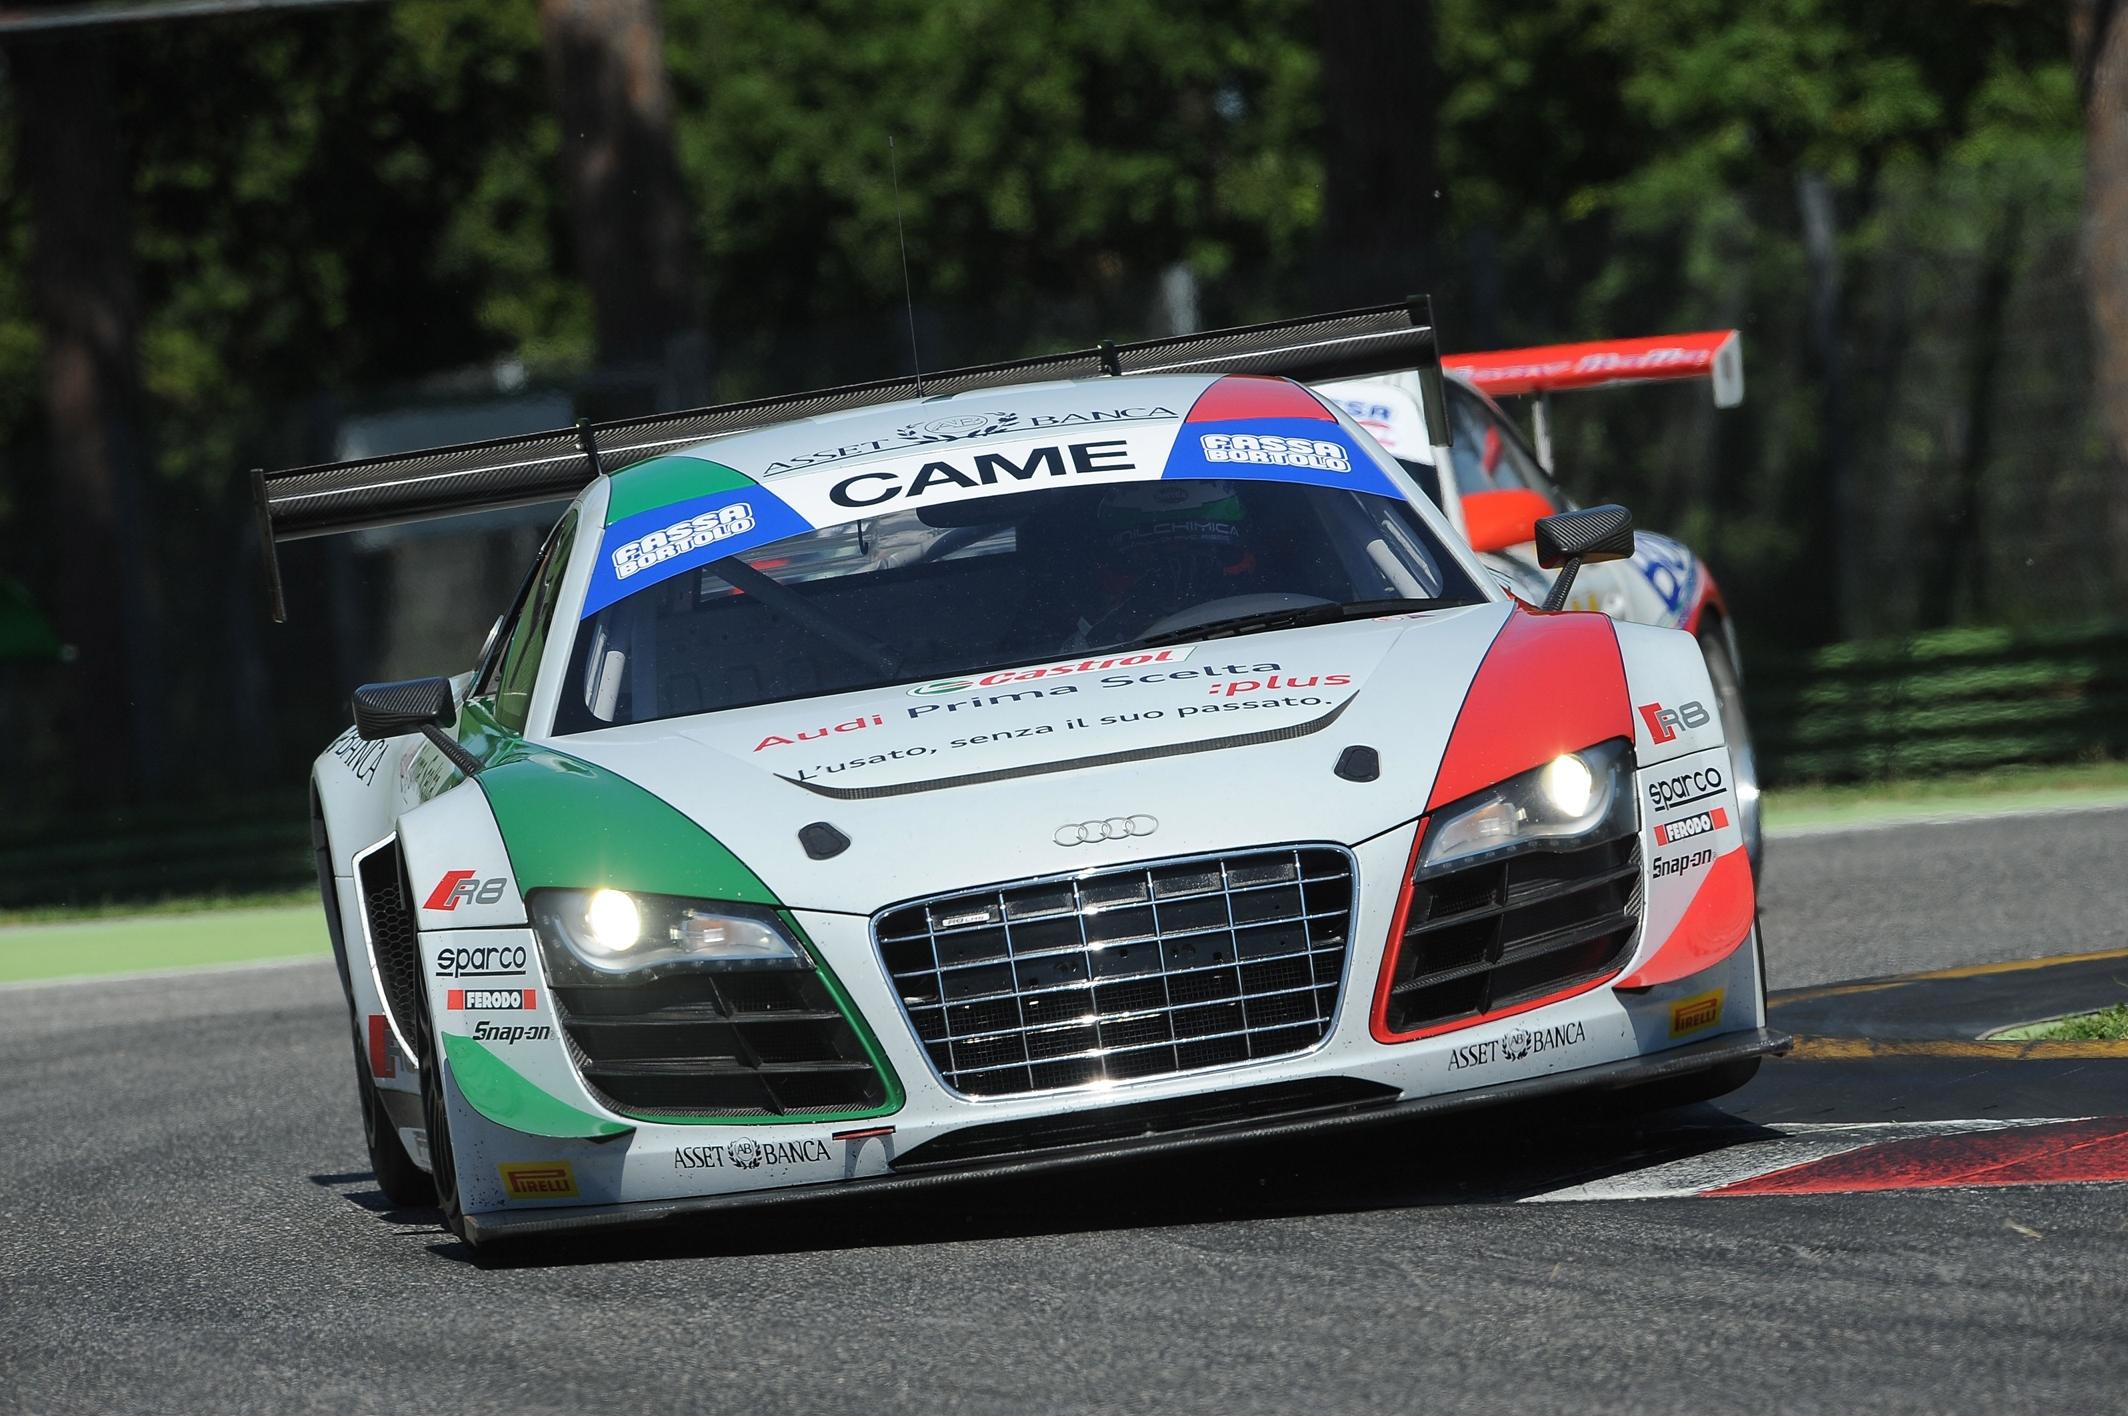 Campeonato GT gran premio de San Marino (imola) 2015-img-cigt-imola-07_mapelli_18